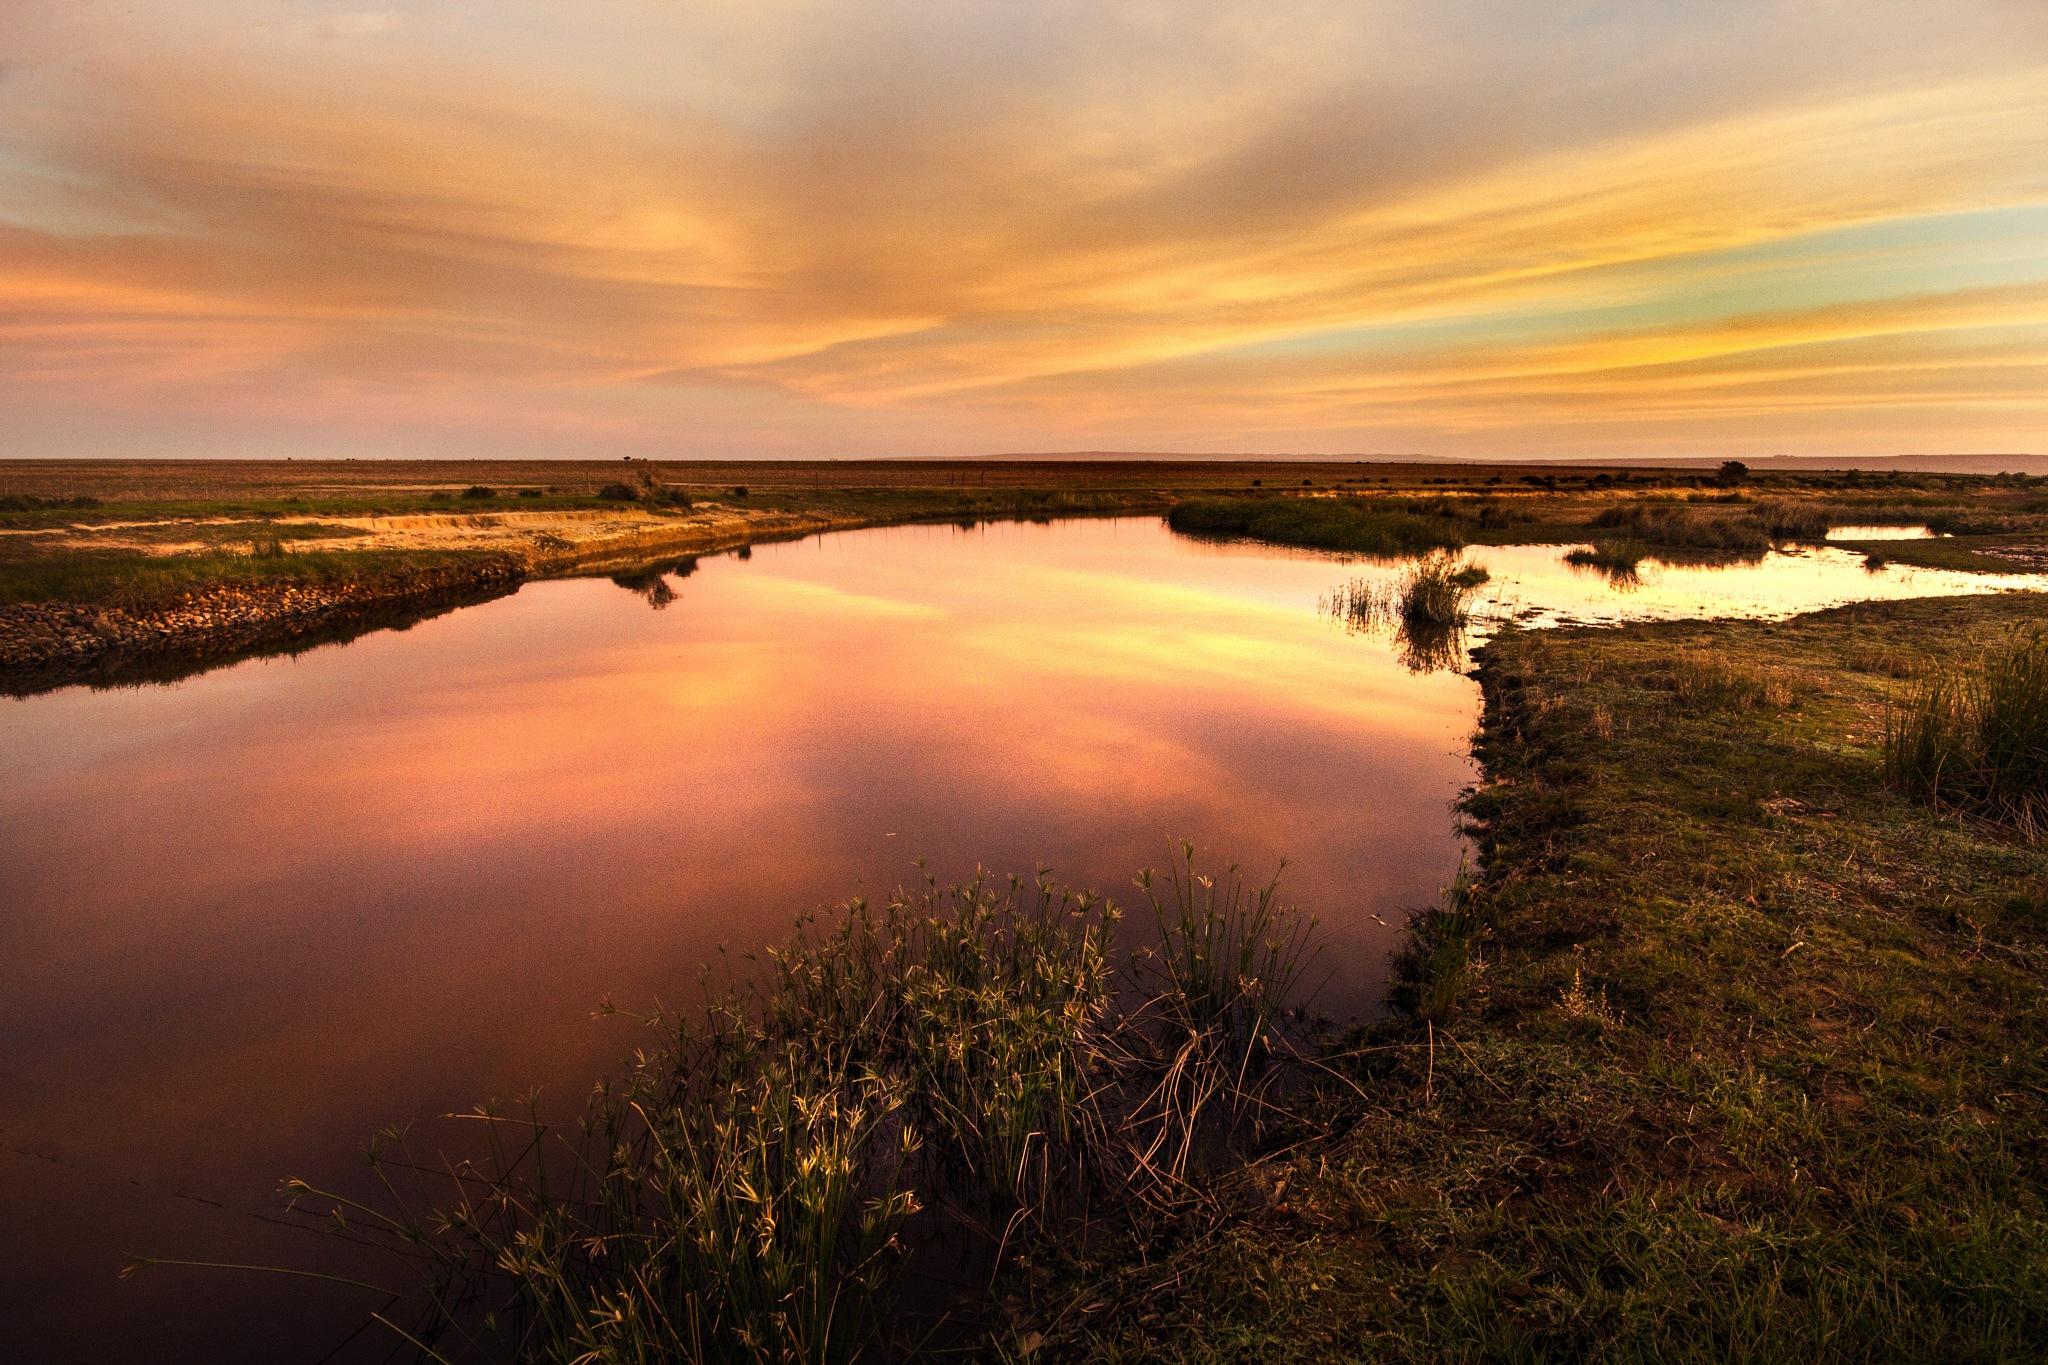 Pond at sunset by Nauta Piscatorque